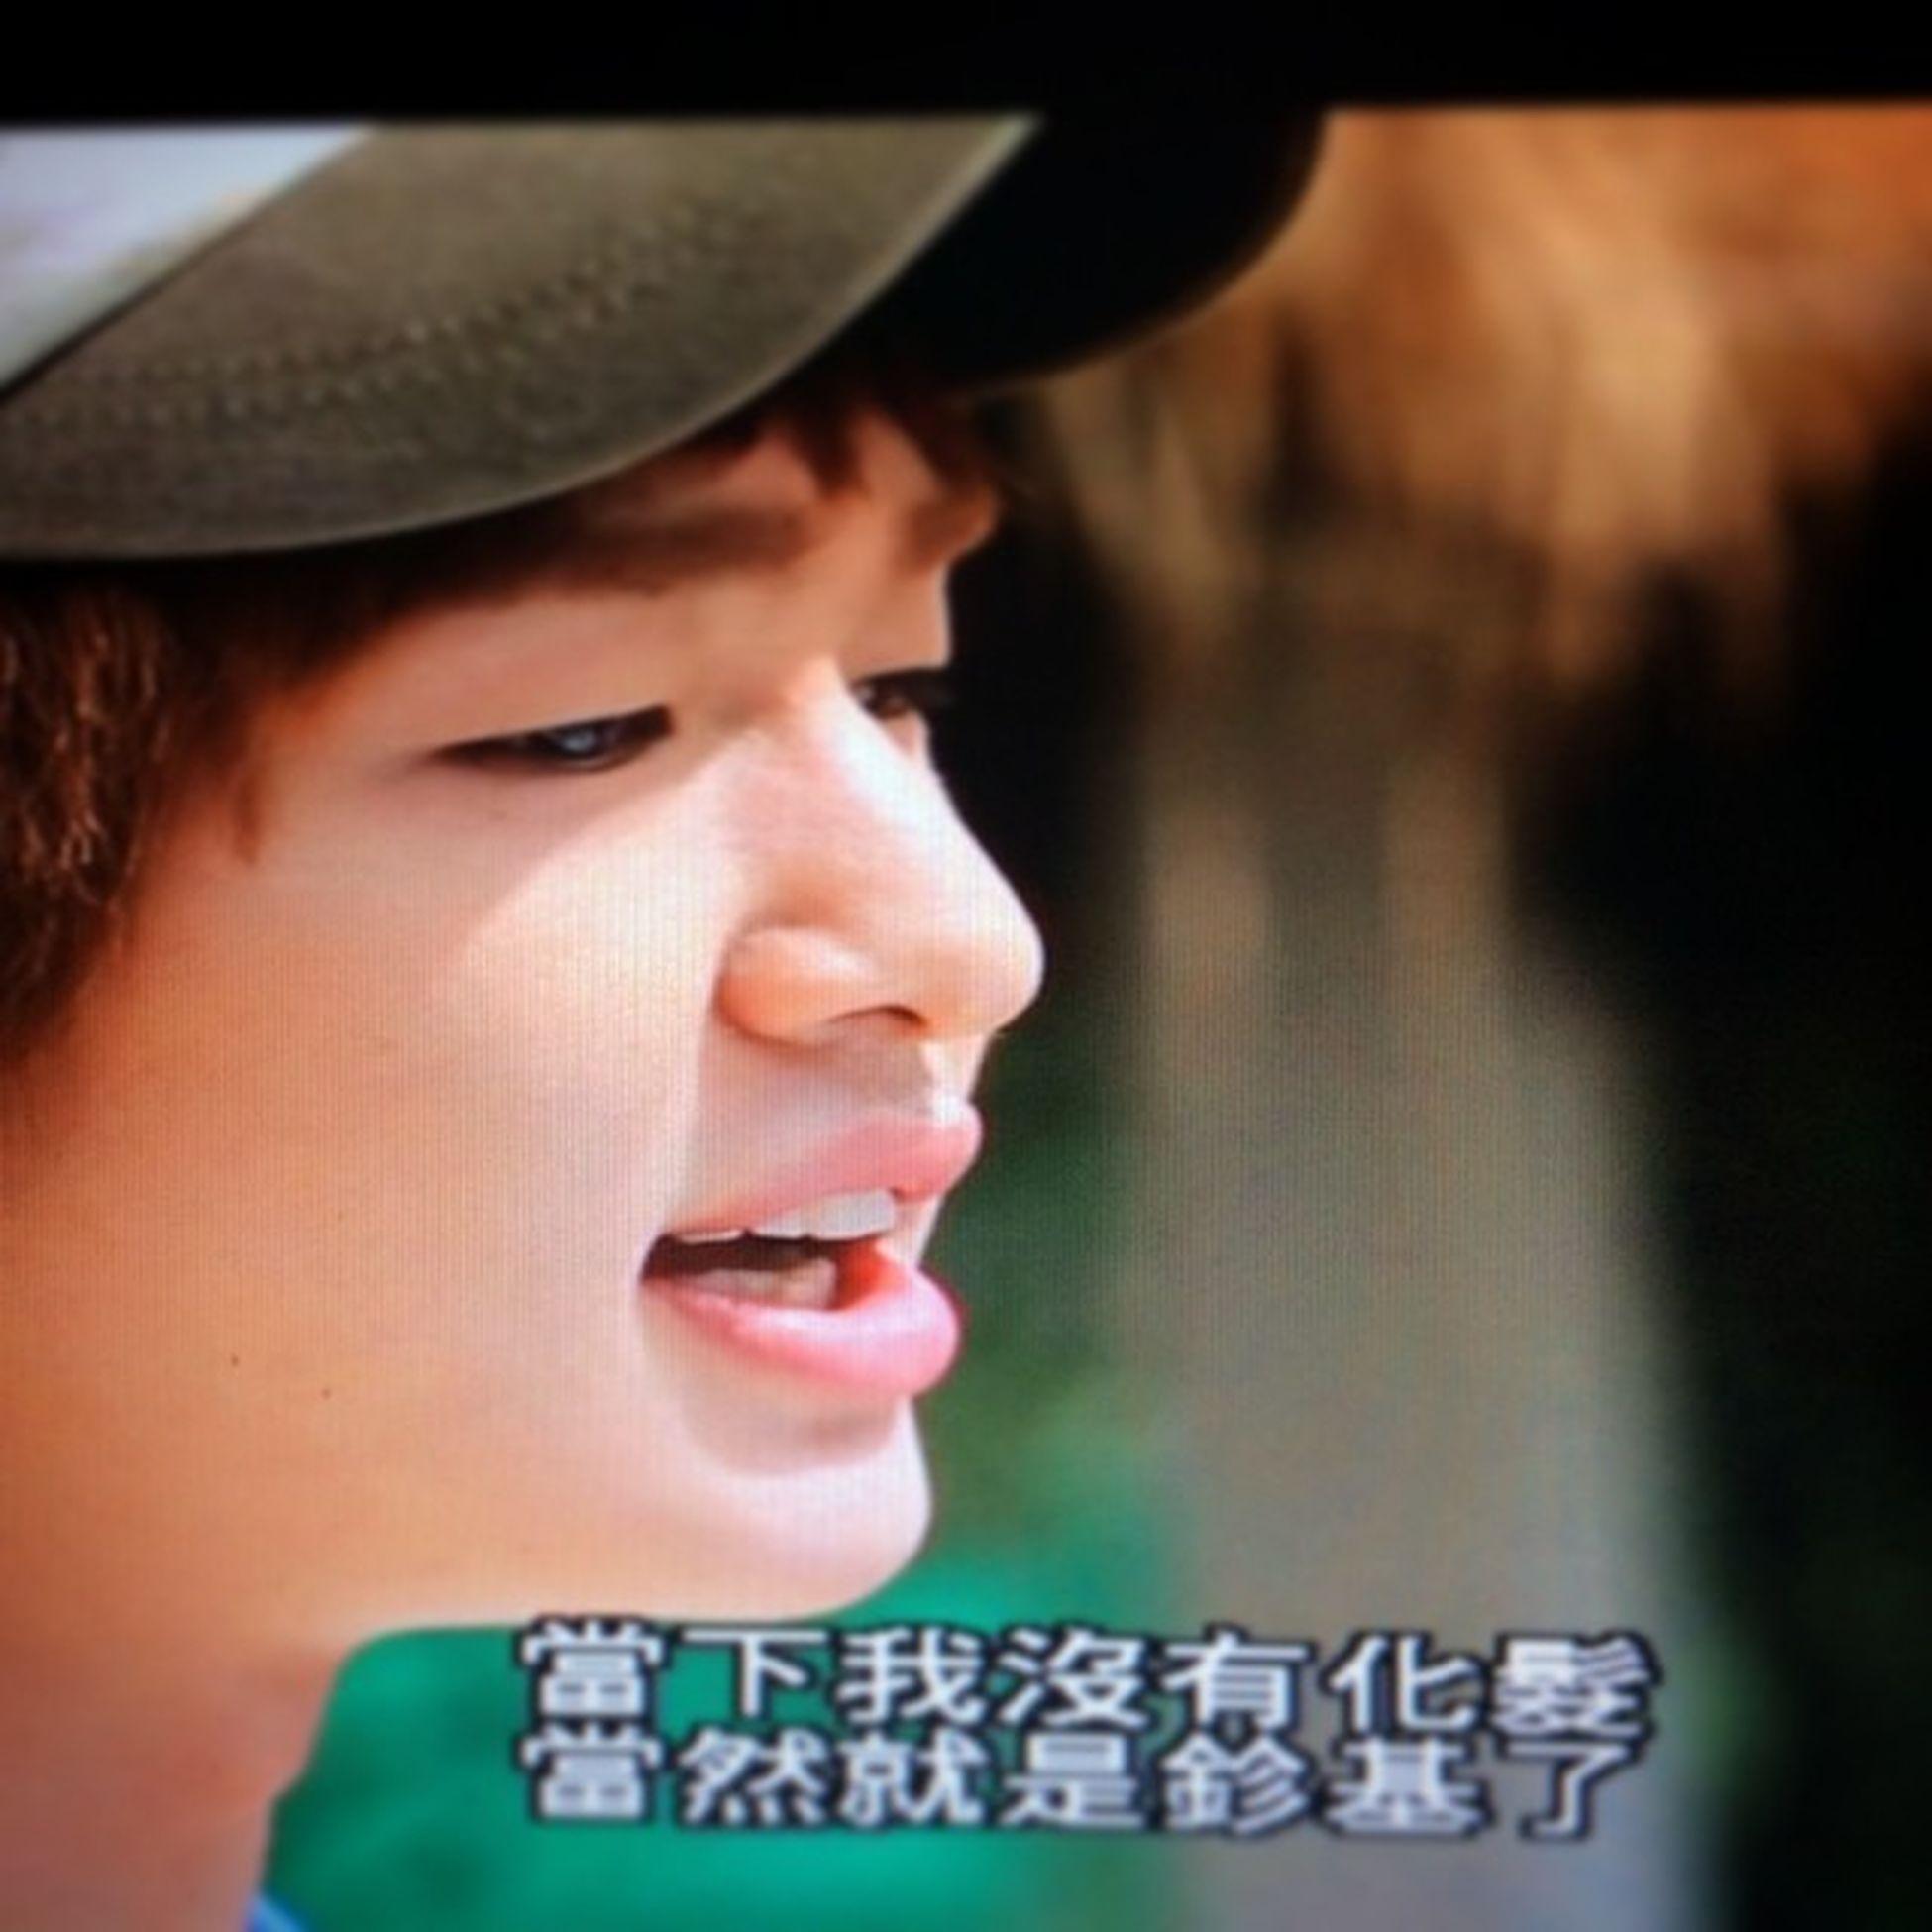 名字很詭異... Shinee ONEW Jinki SurpriseVacation taiwan taichung